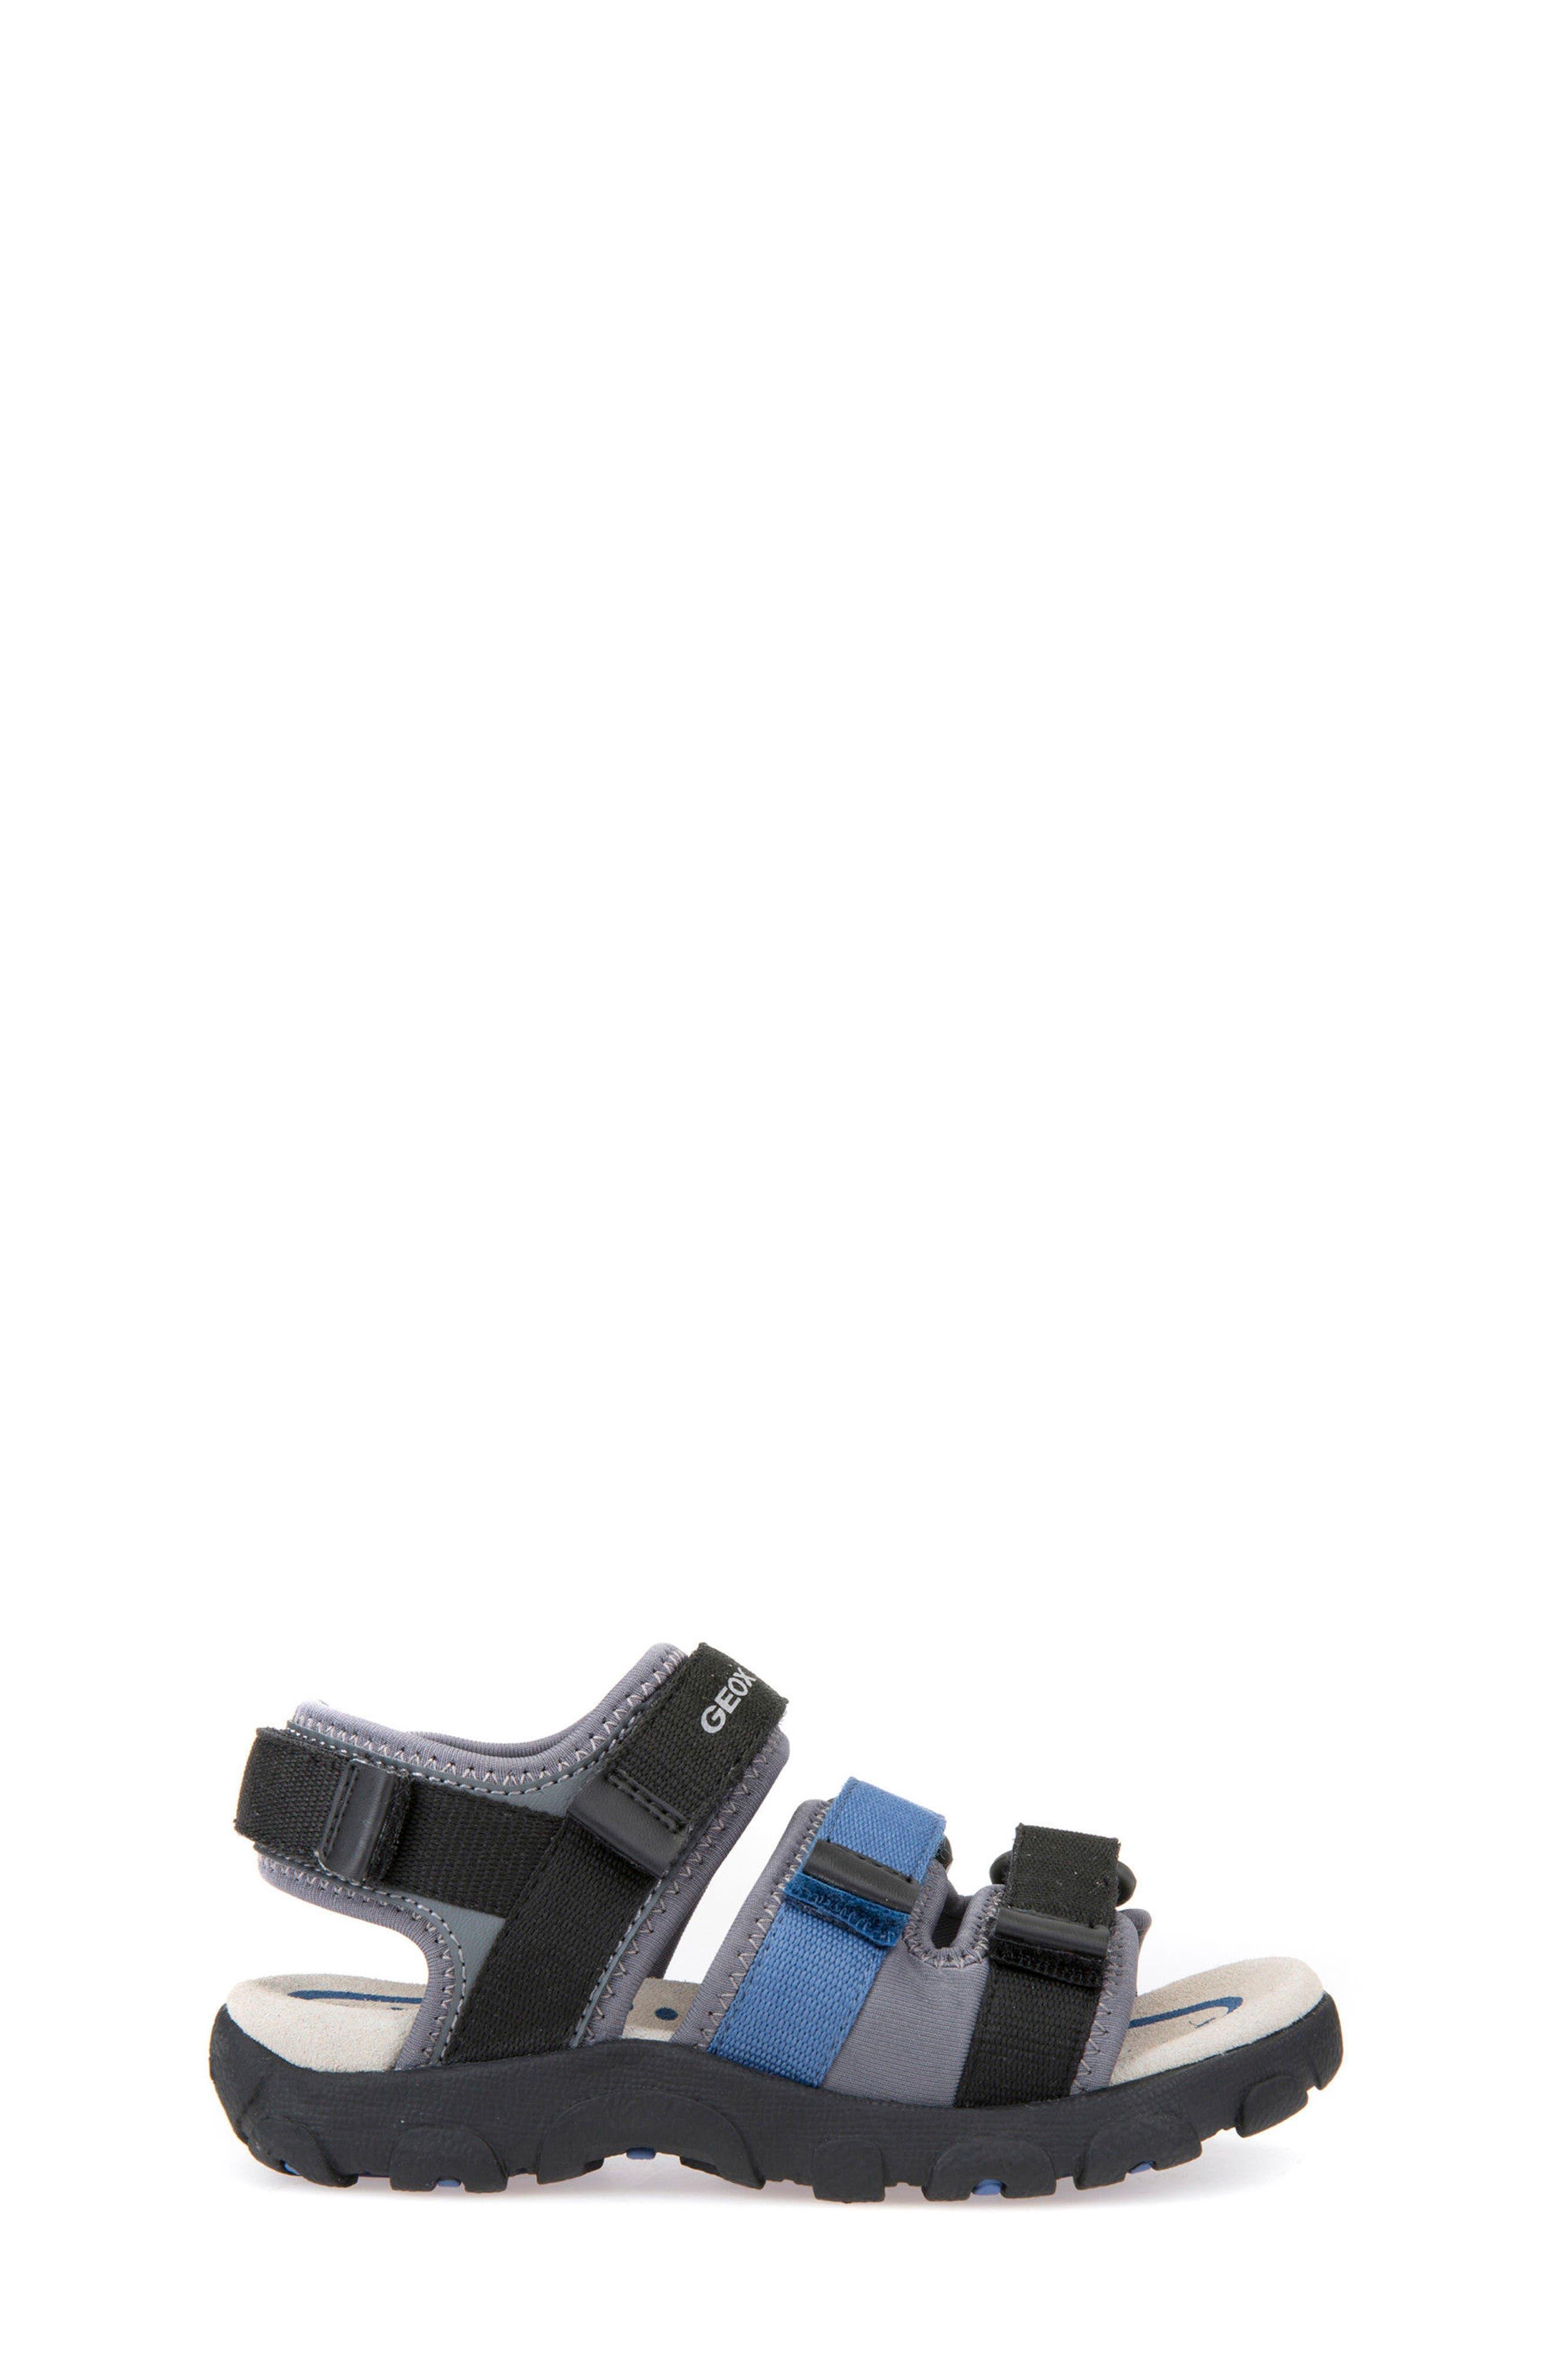 Strada Sandal,                             Alternate thumbnail 3, color,                             Black/ Blue